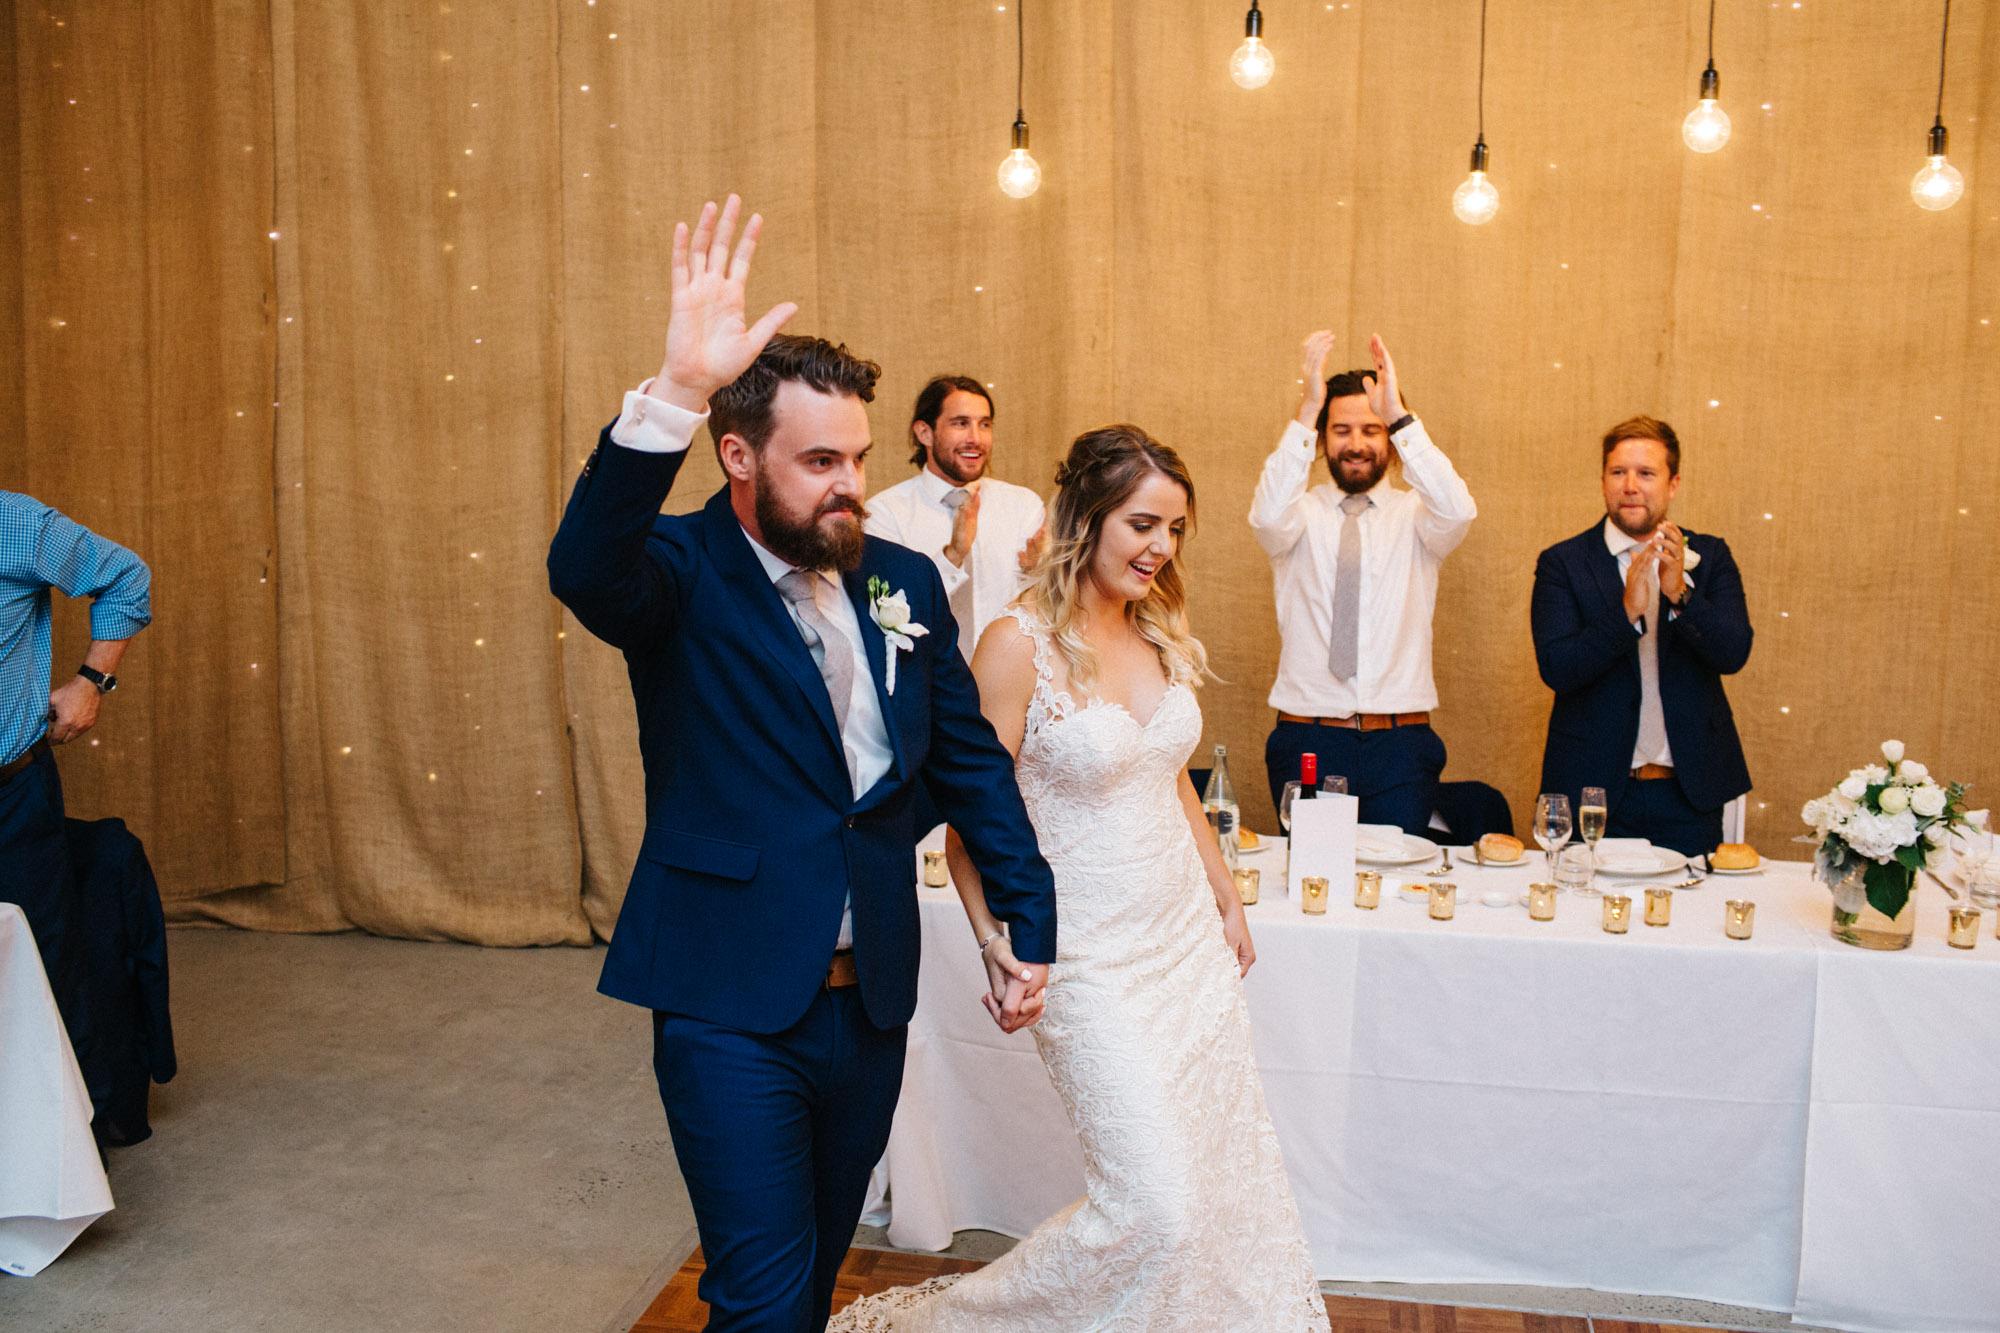 Golding-Wines-wedding-photography-098.jpg